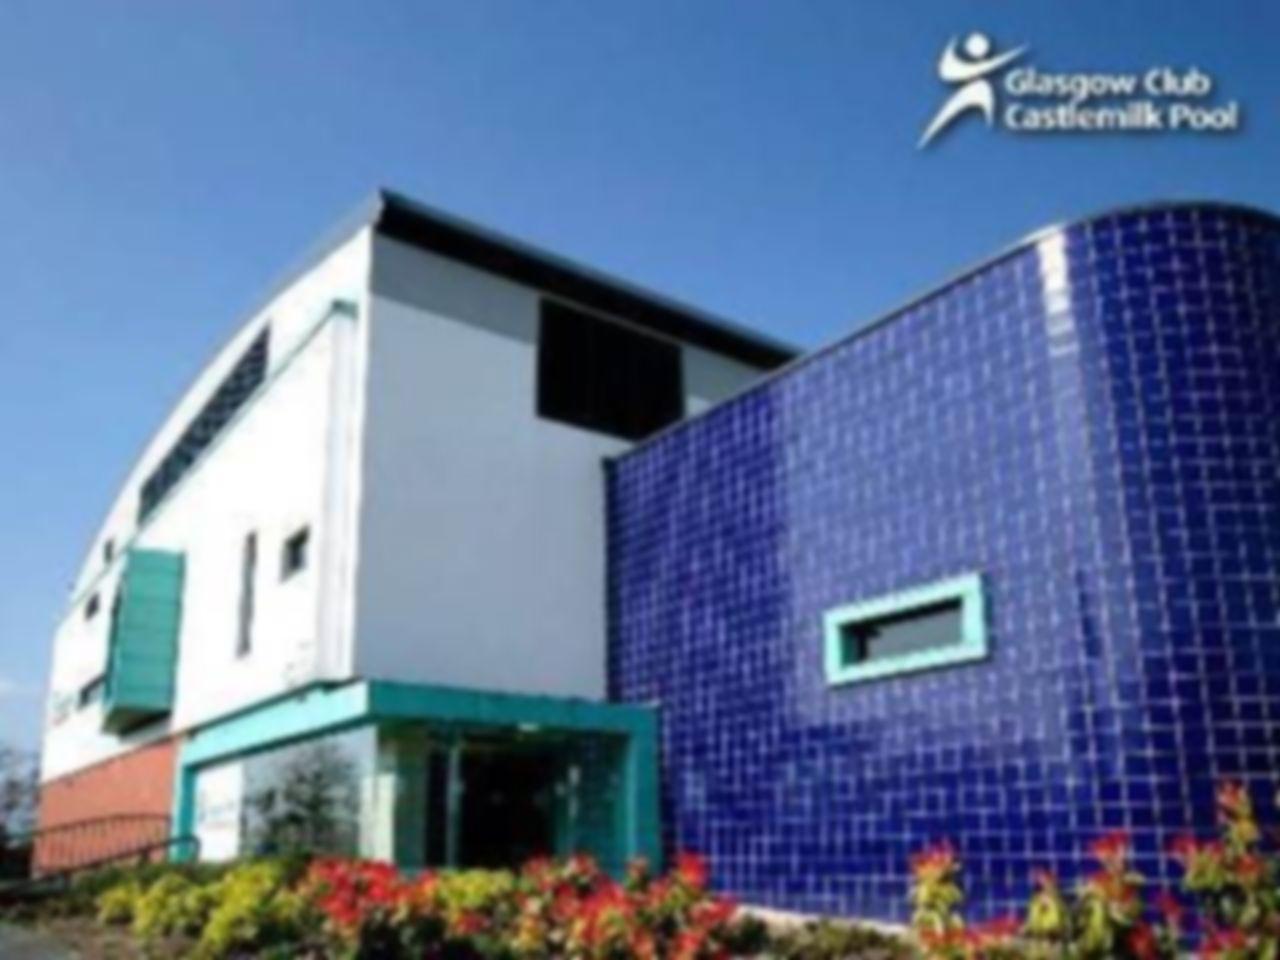 Glasgow club castlemilk flexible gym passes g45 glasgow - Castlemilk swimming pool opening hours ...